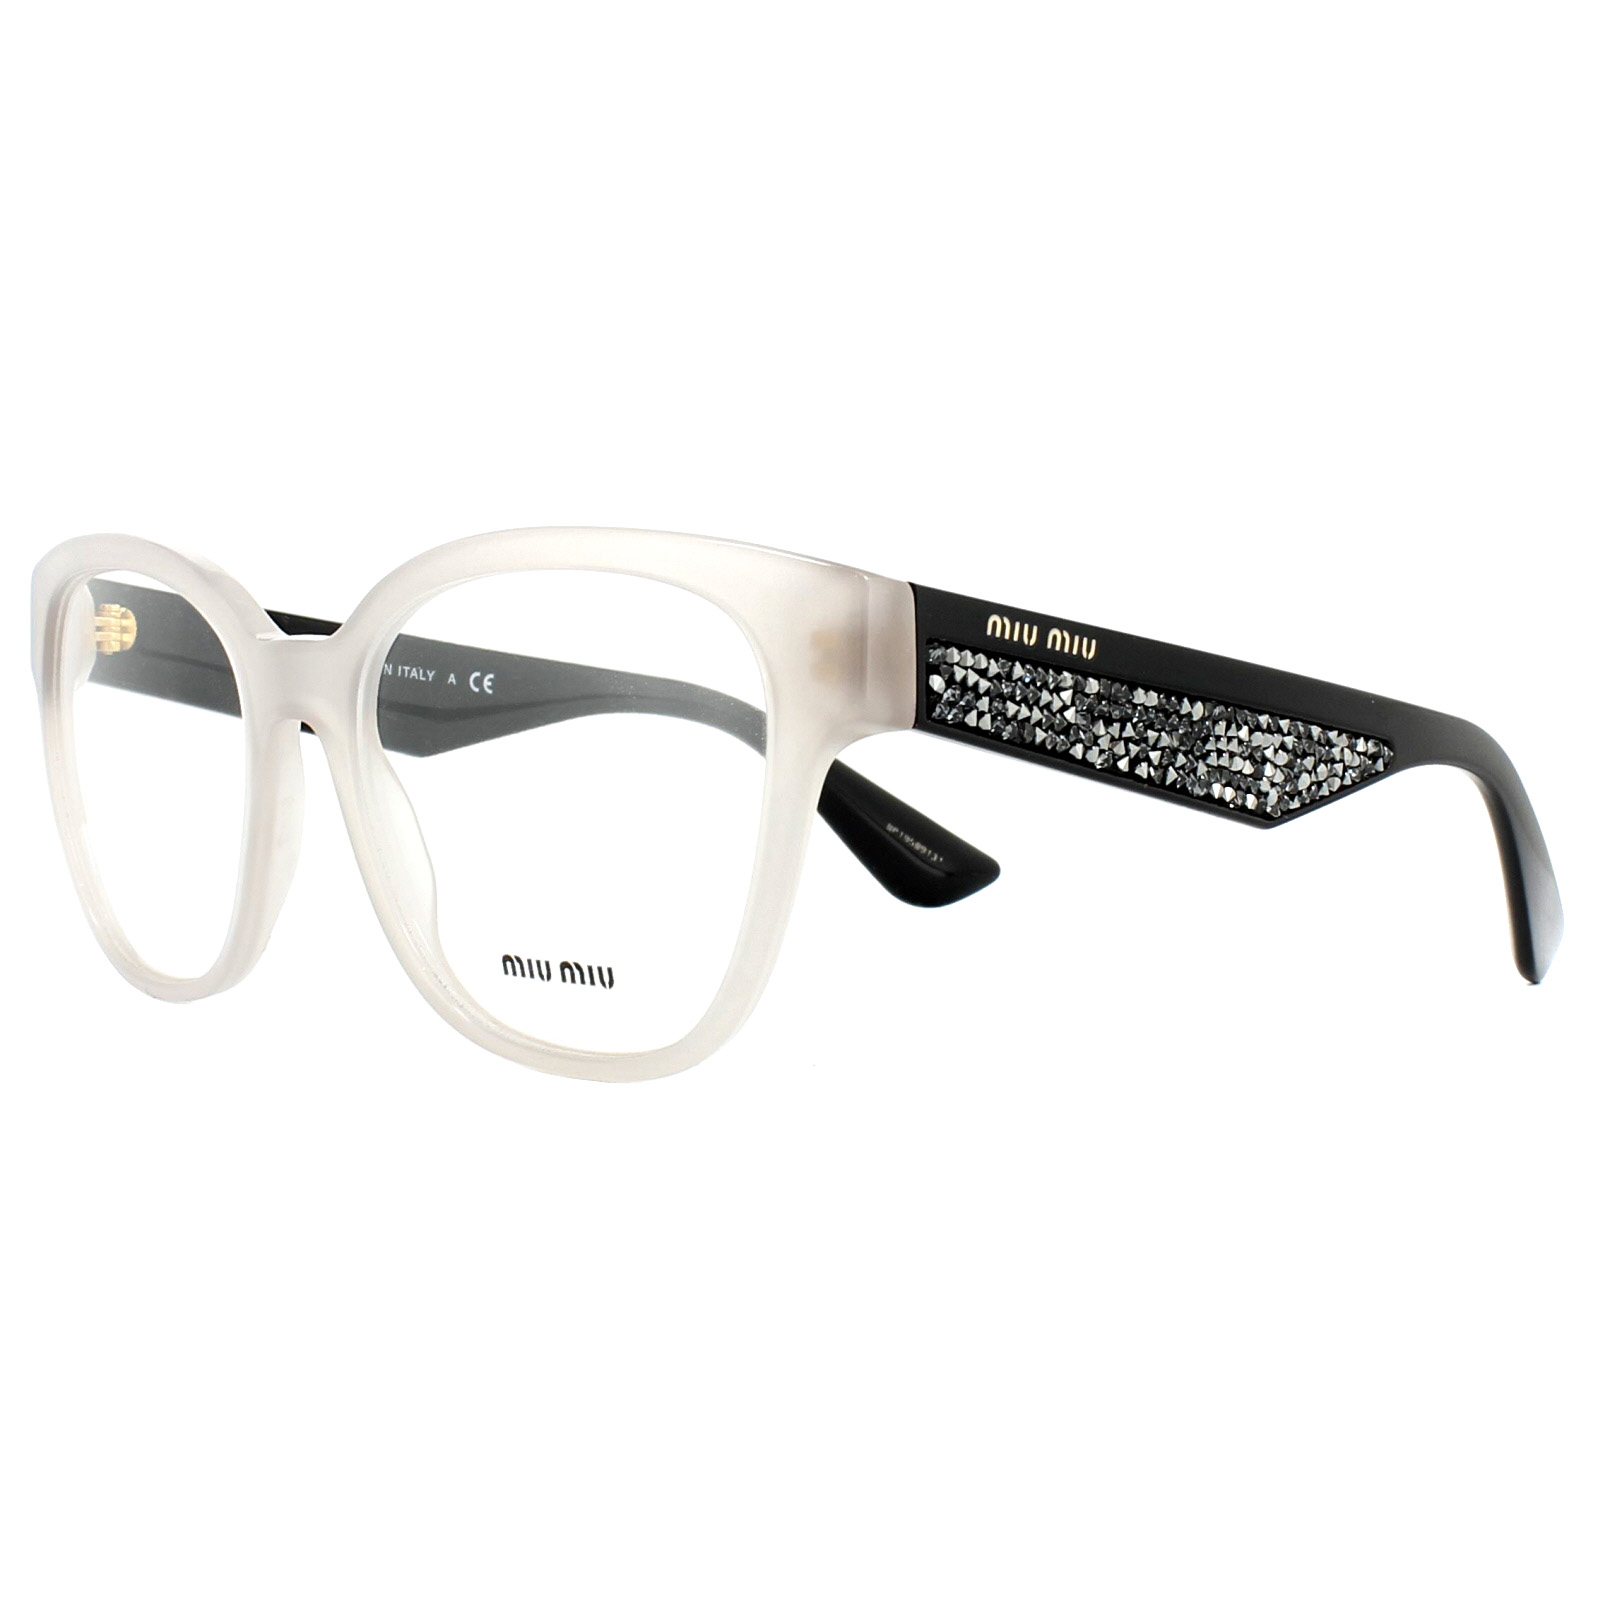 348832a2c0f Sentinel Miu Miu Glasses Frames MU06OV UE21O1 Opal Argil 52mm Womens